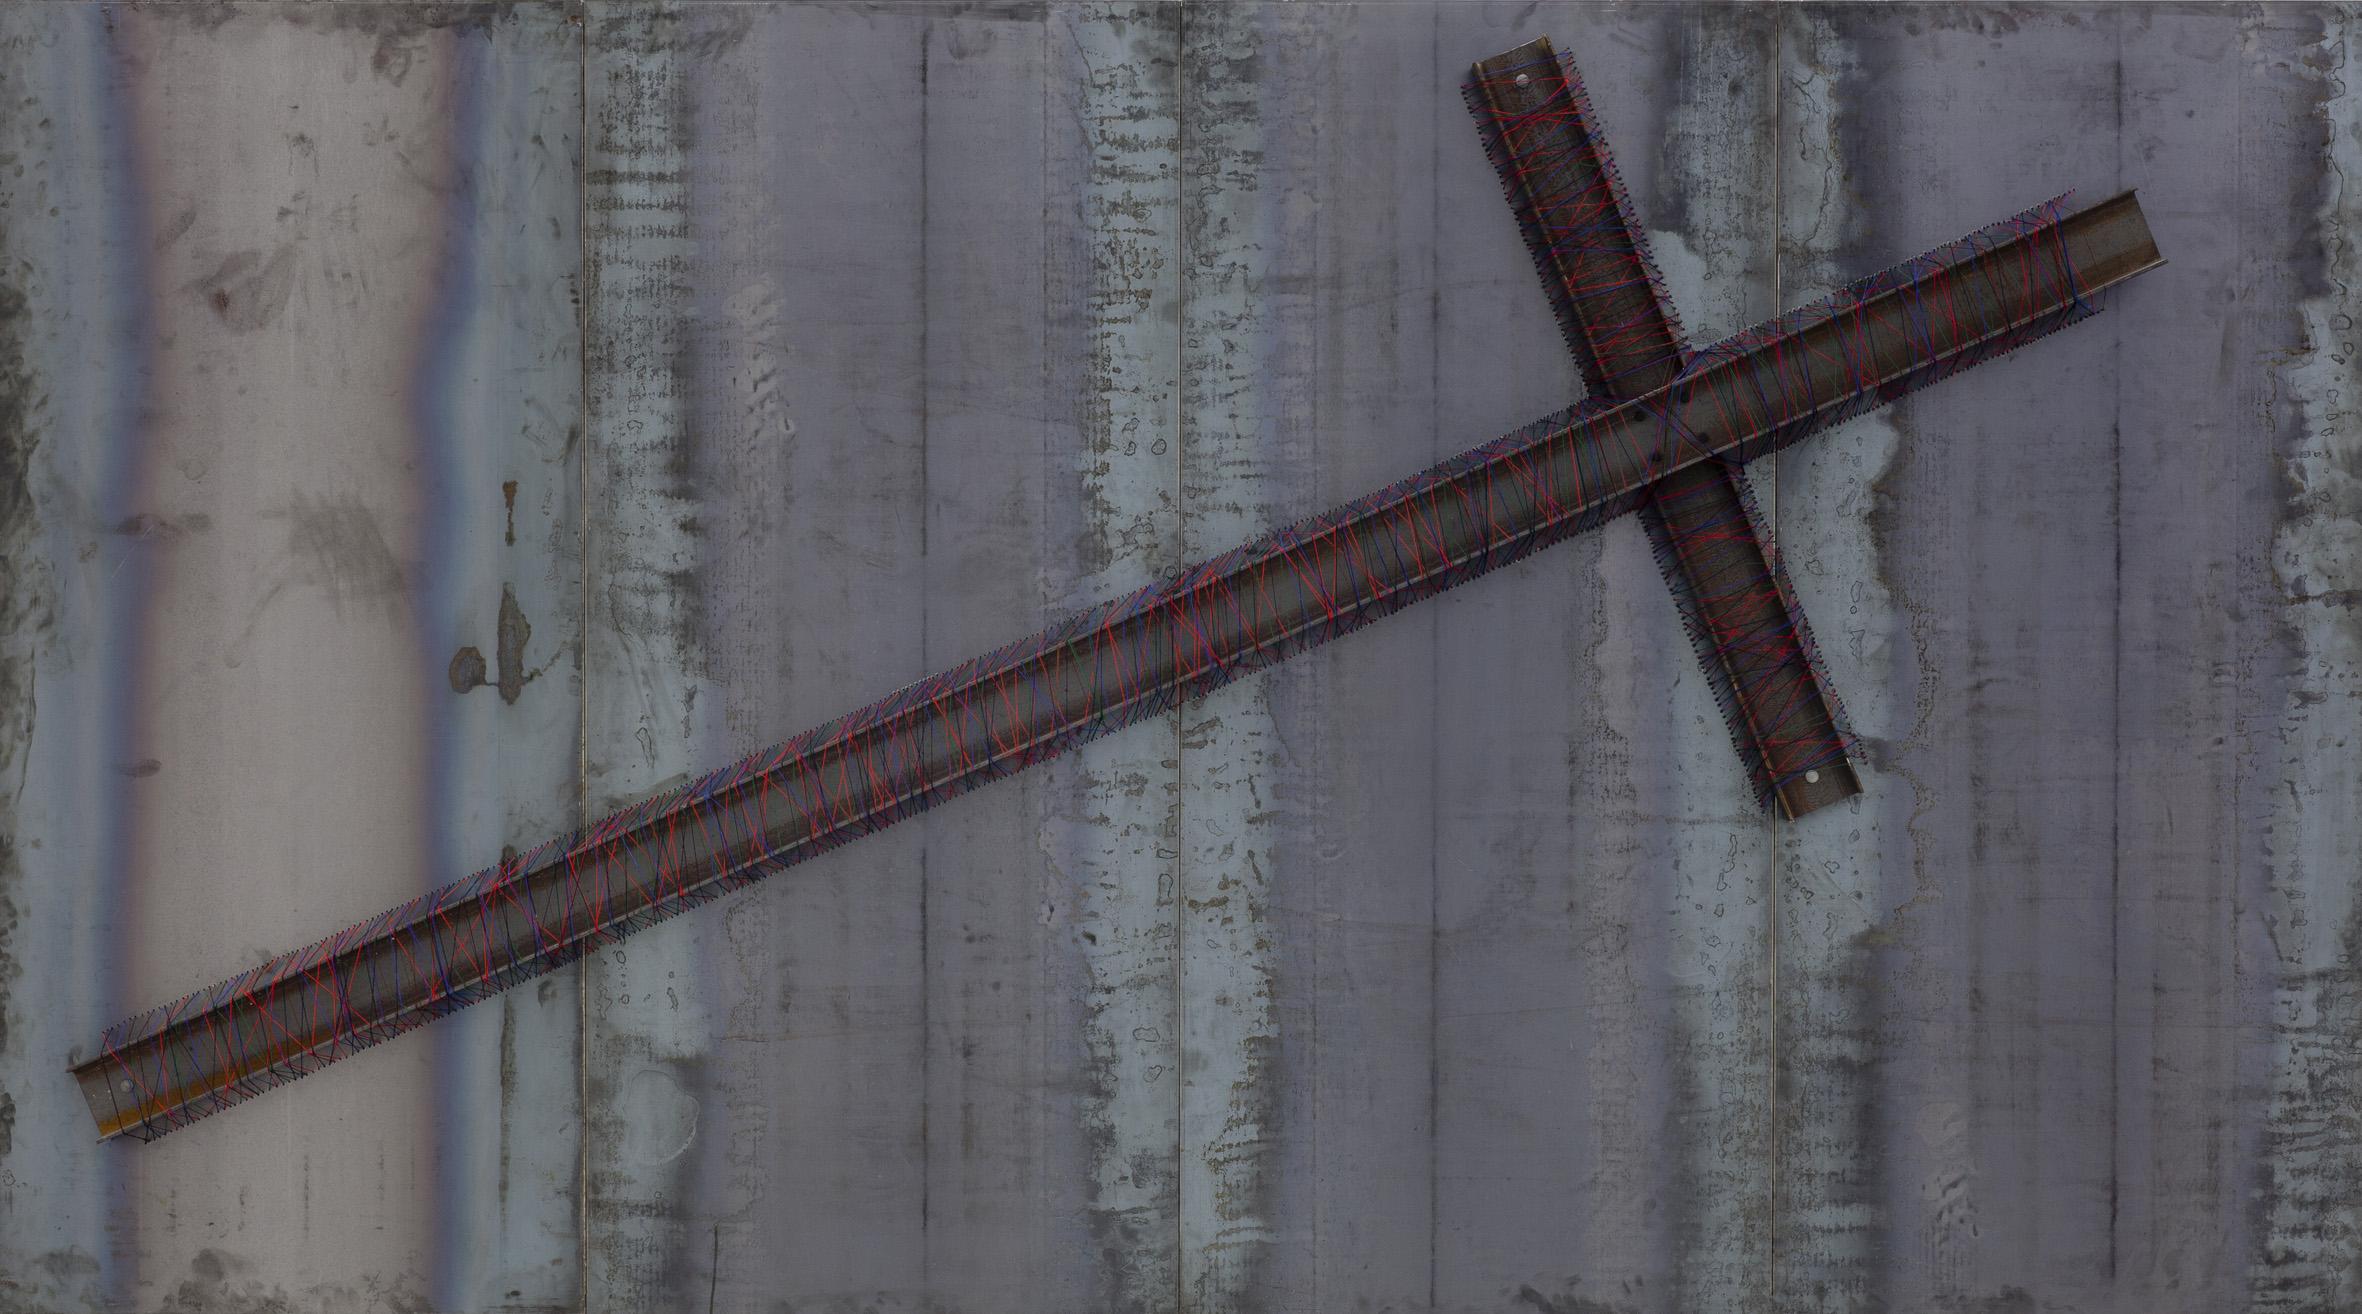 Jannis Kounellis, Punto croce, 2013 - Galleria Christian Stein, Milano - photo Peppe Avallone